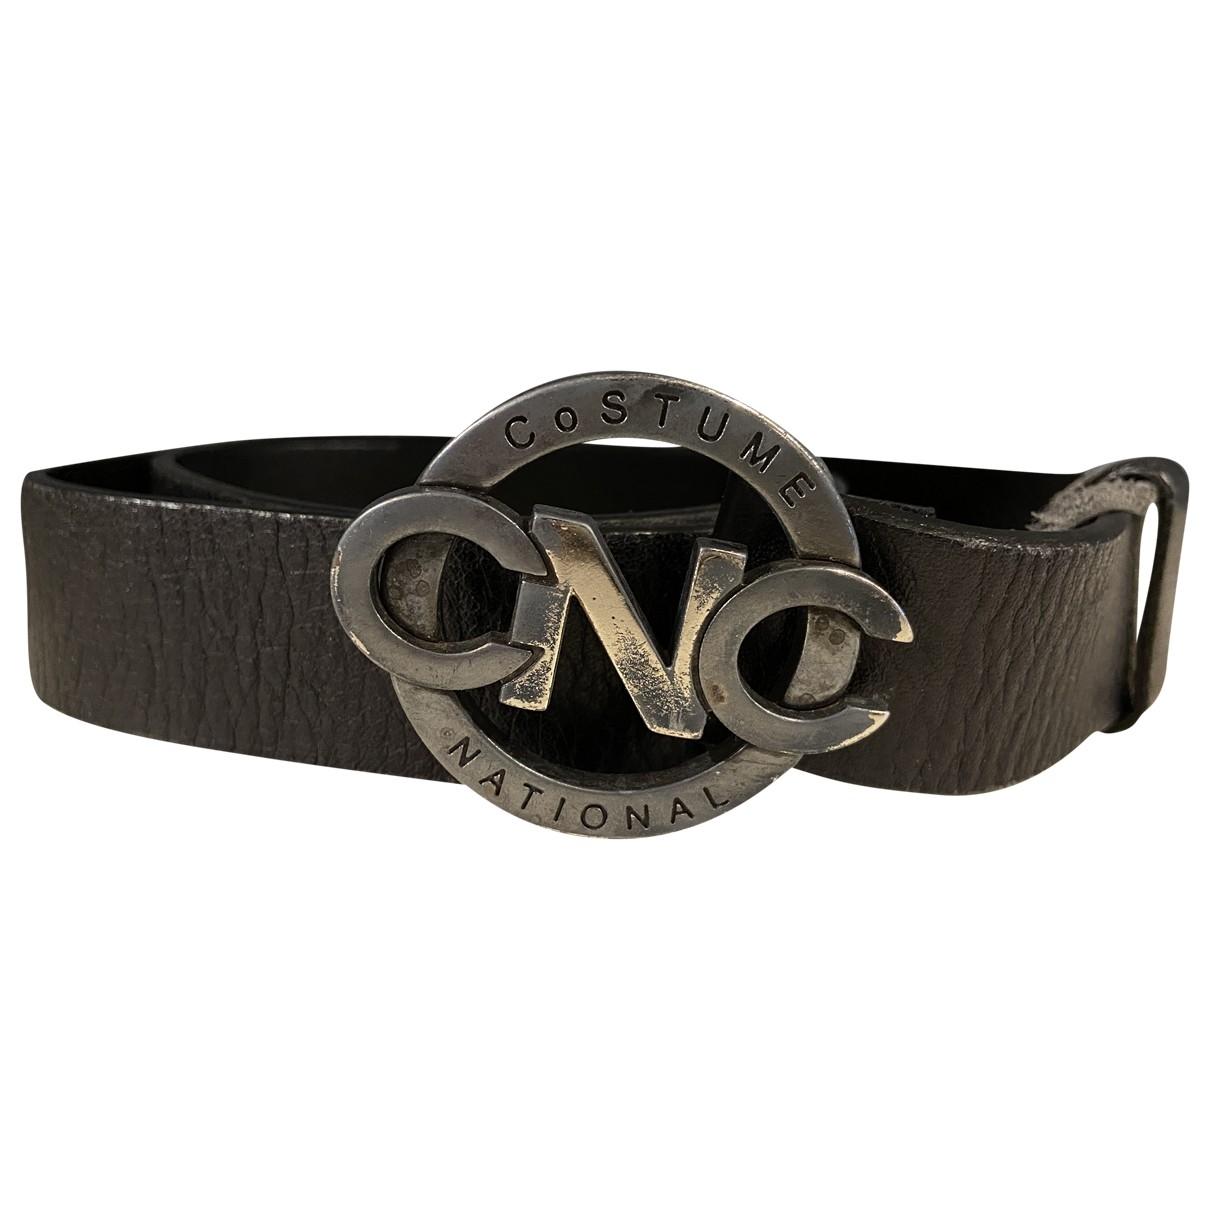 Cinturon Costume National